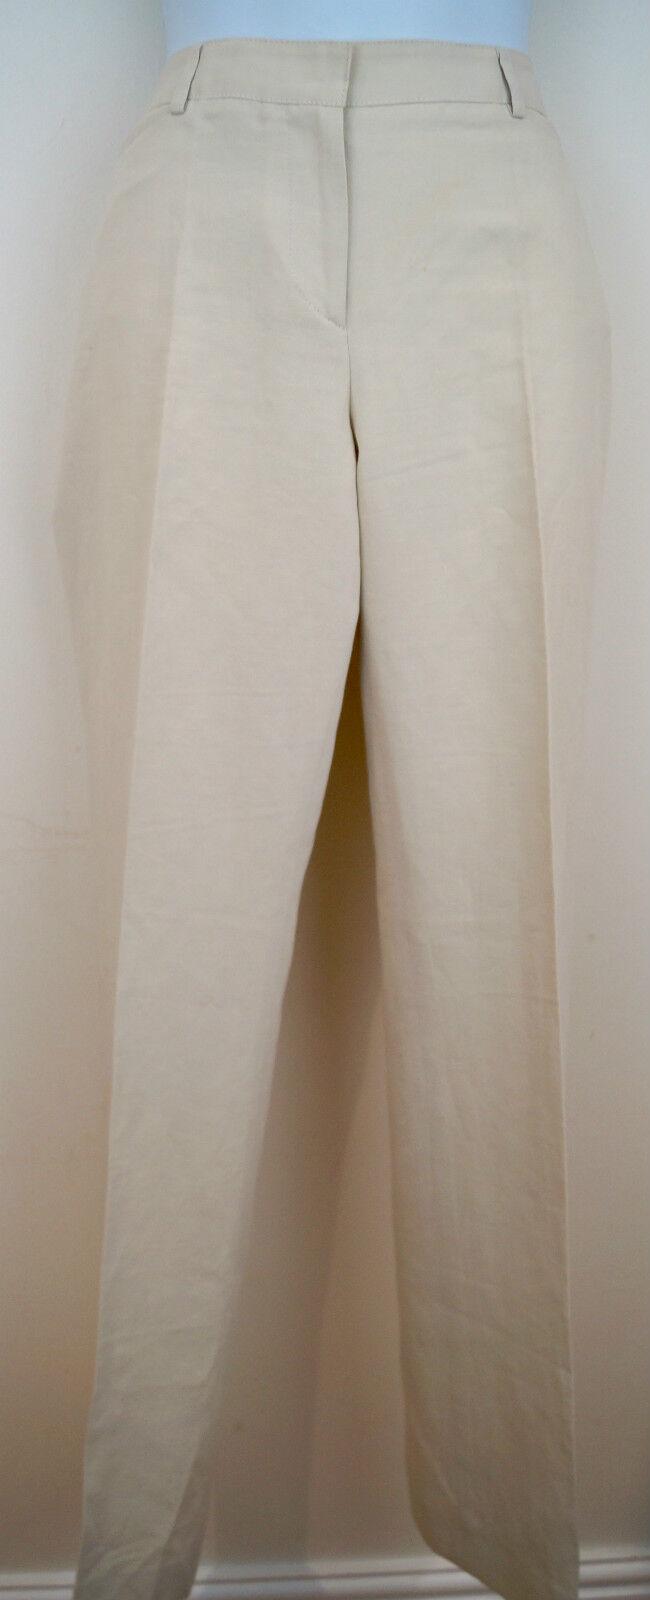 NICOLE FARHI Cream Beige Linen & Cotton Formal Summer Trousers Pants UK10 EU36